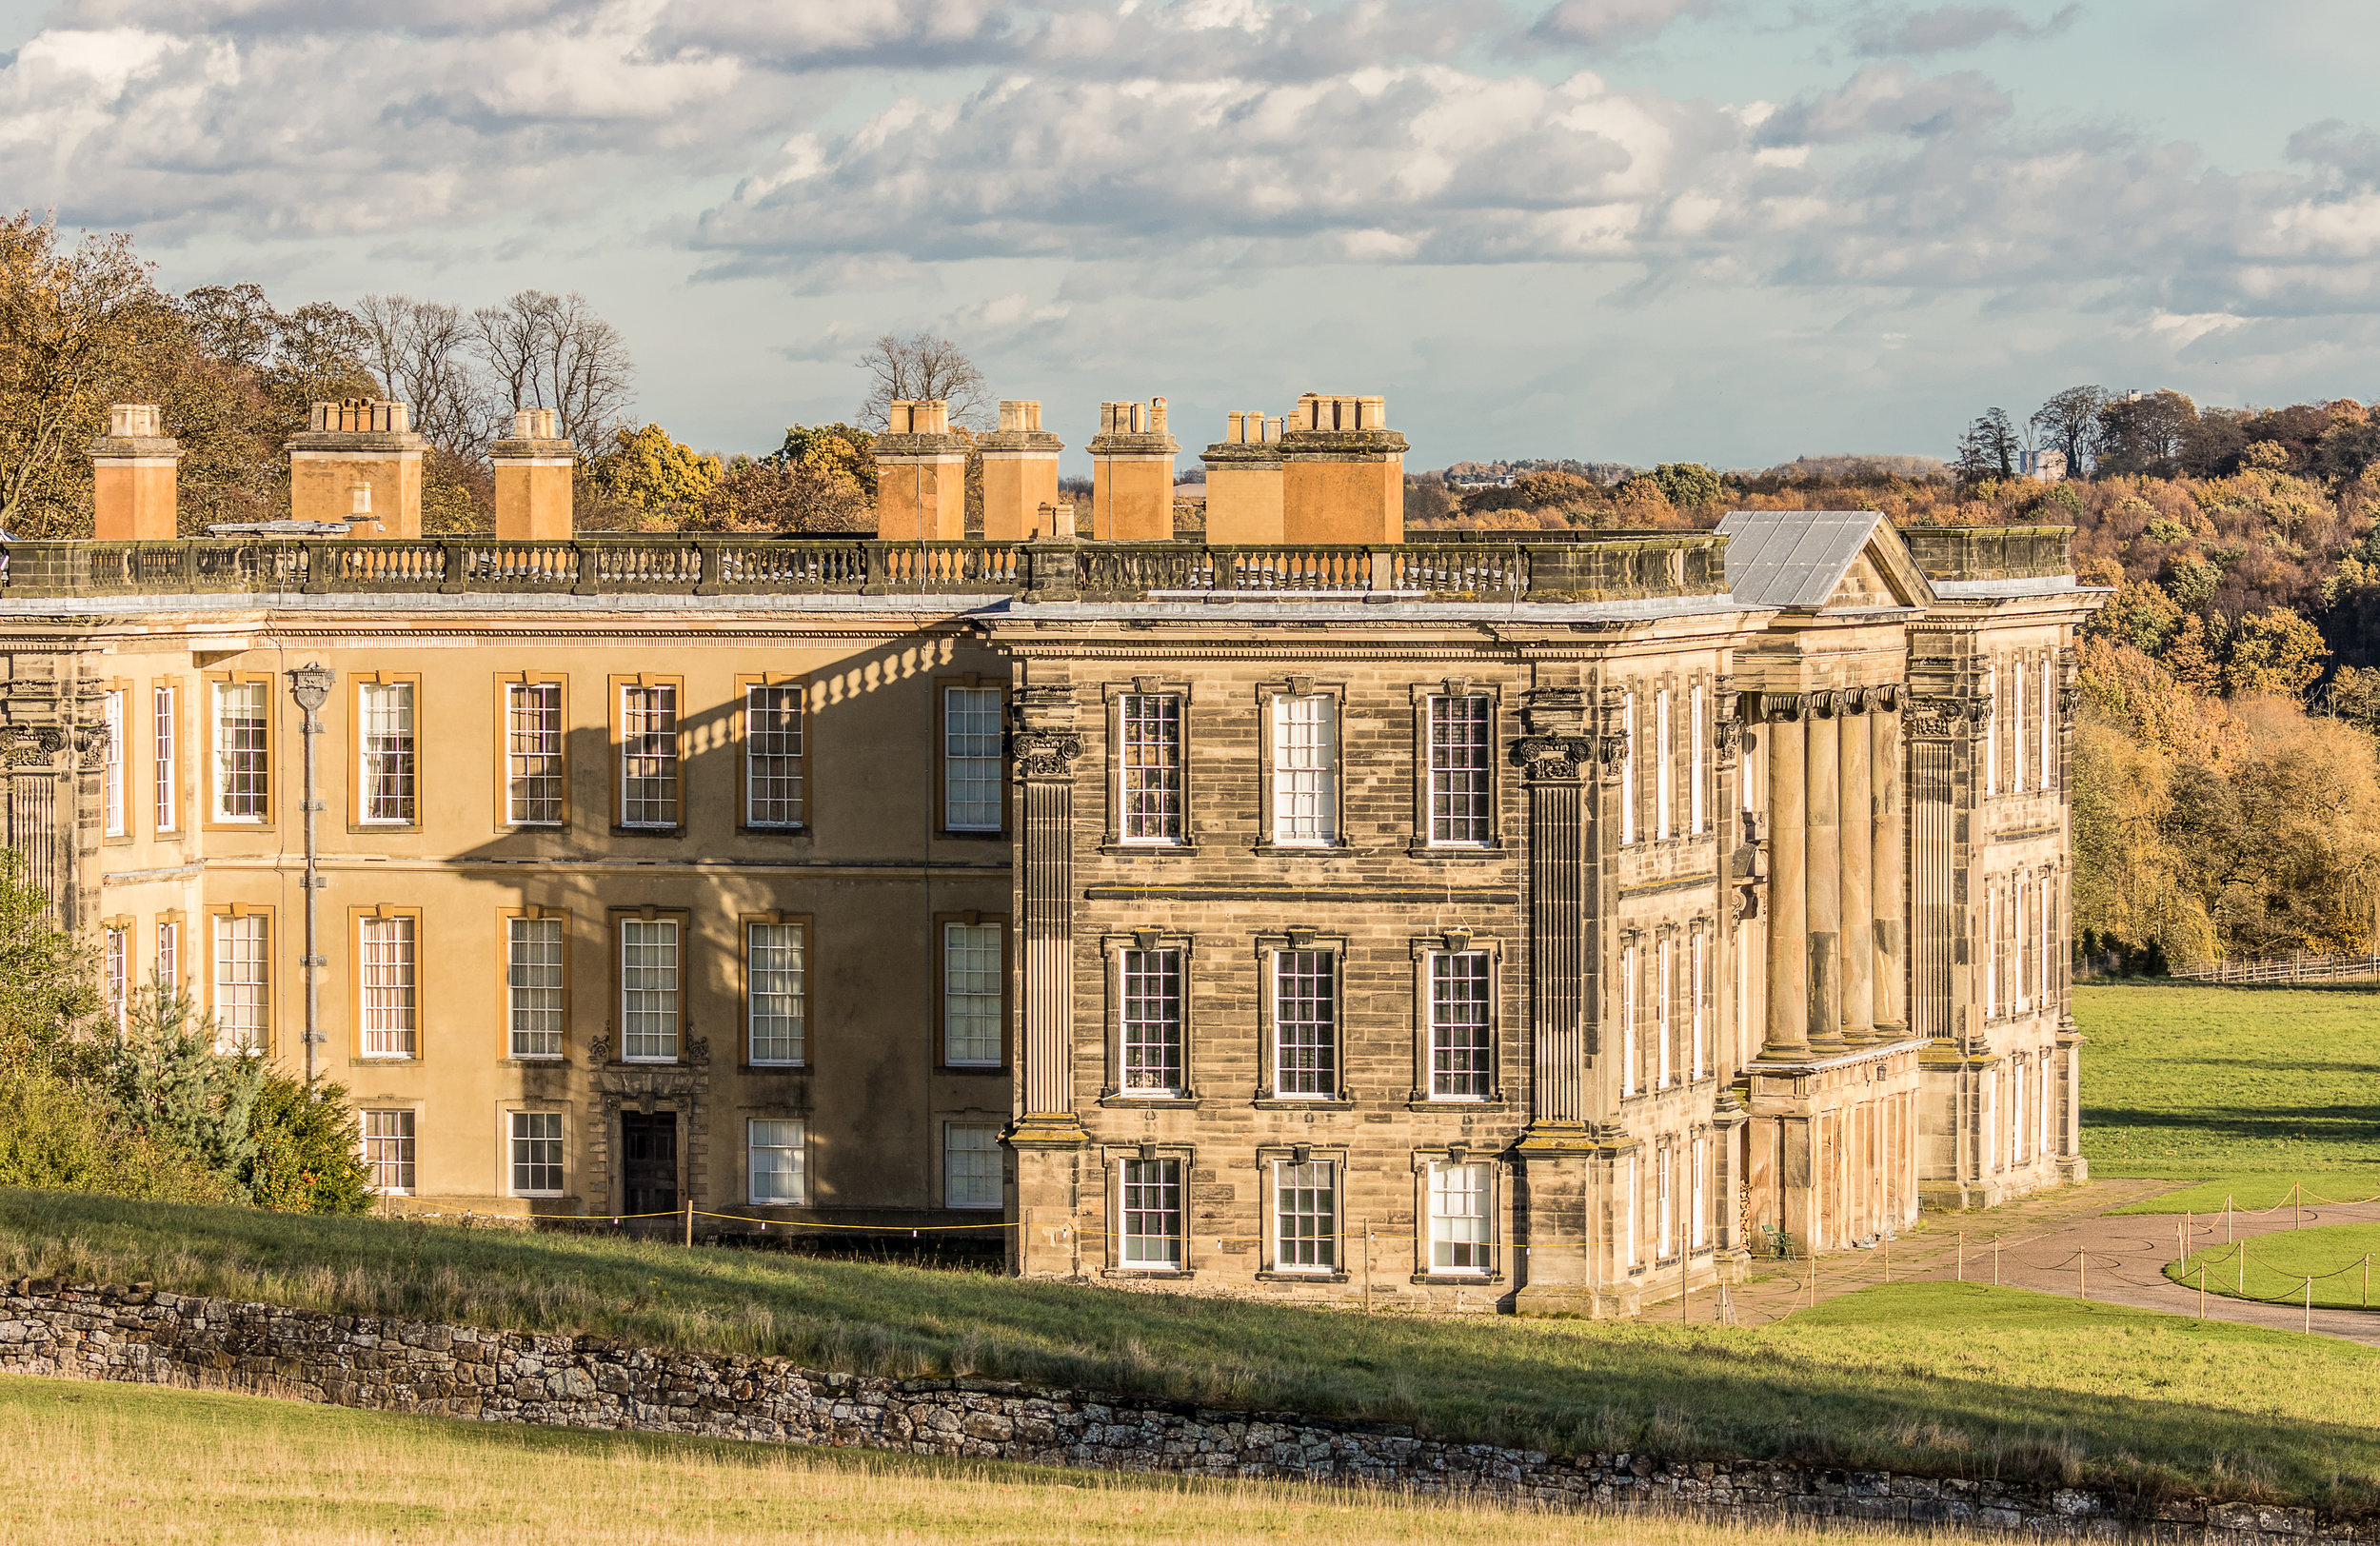 A view of Calke Abbey